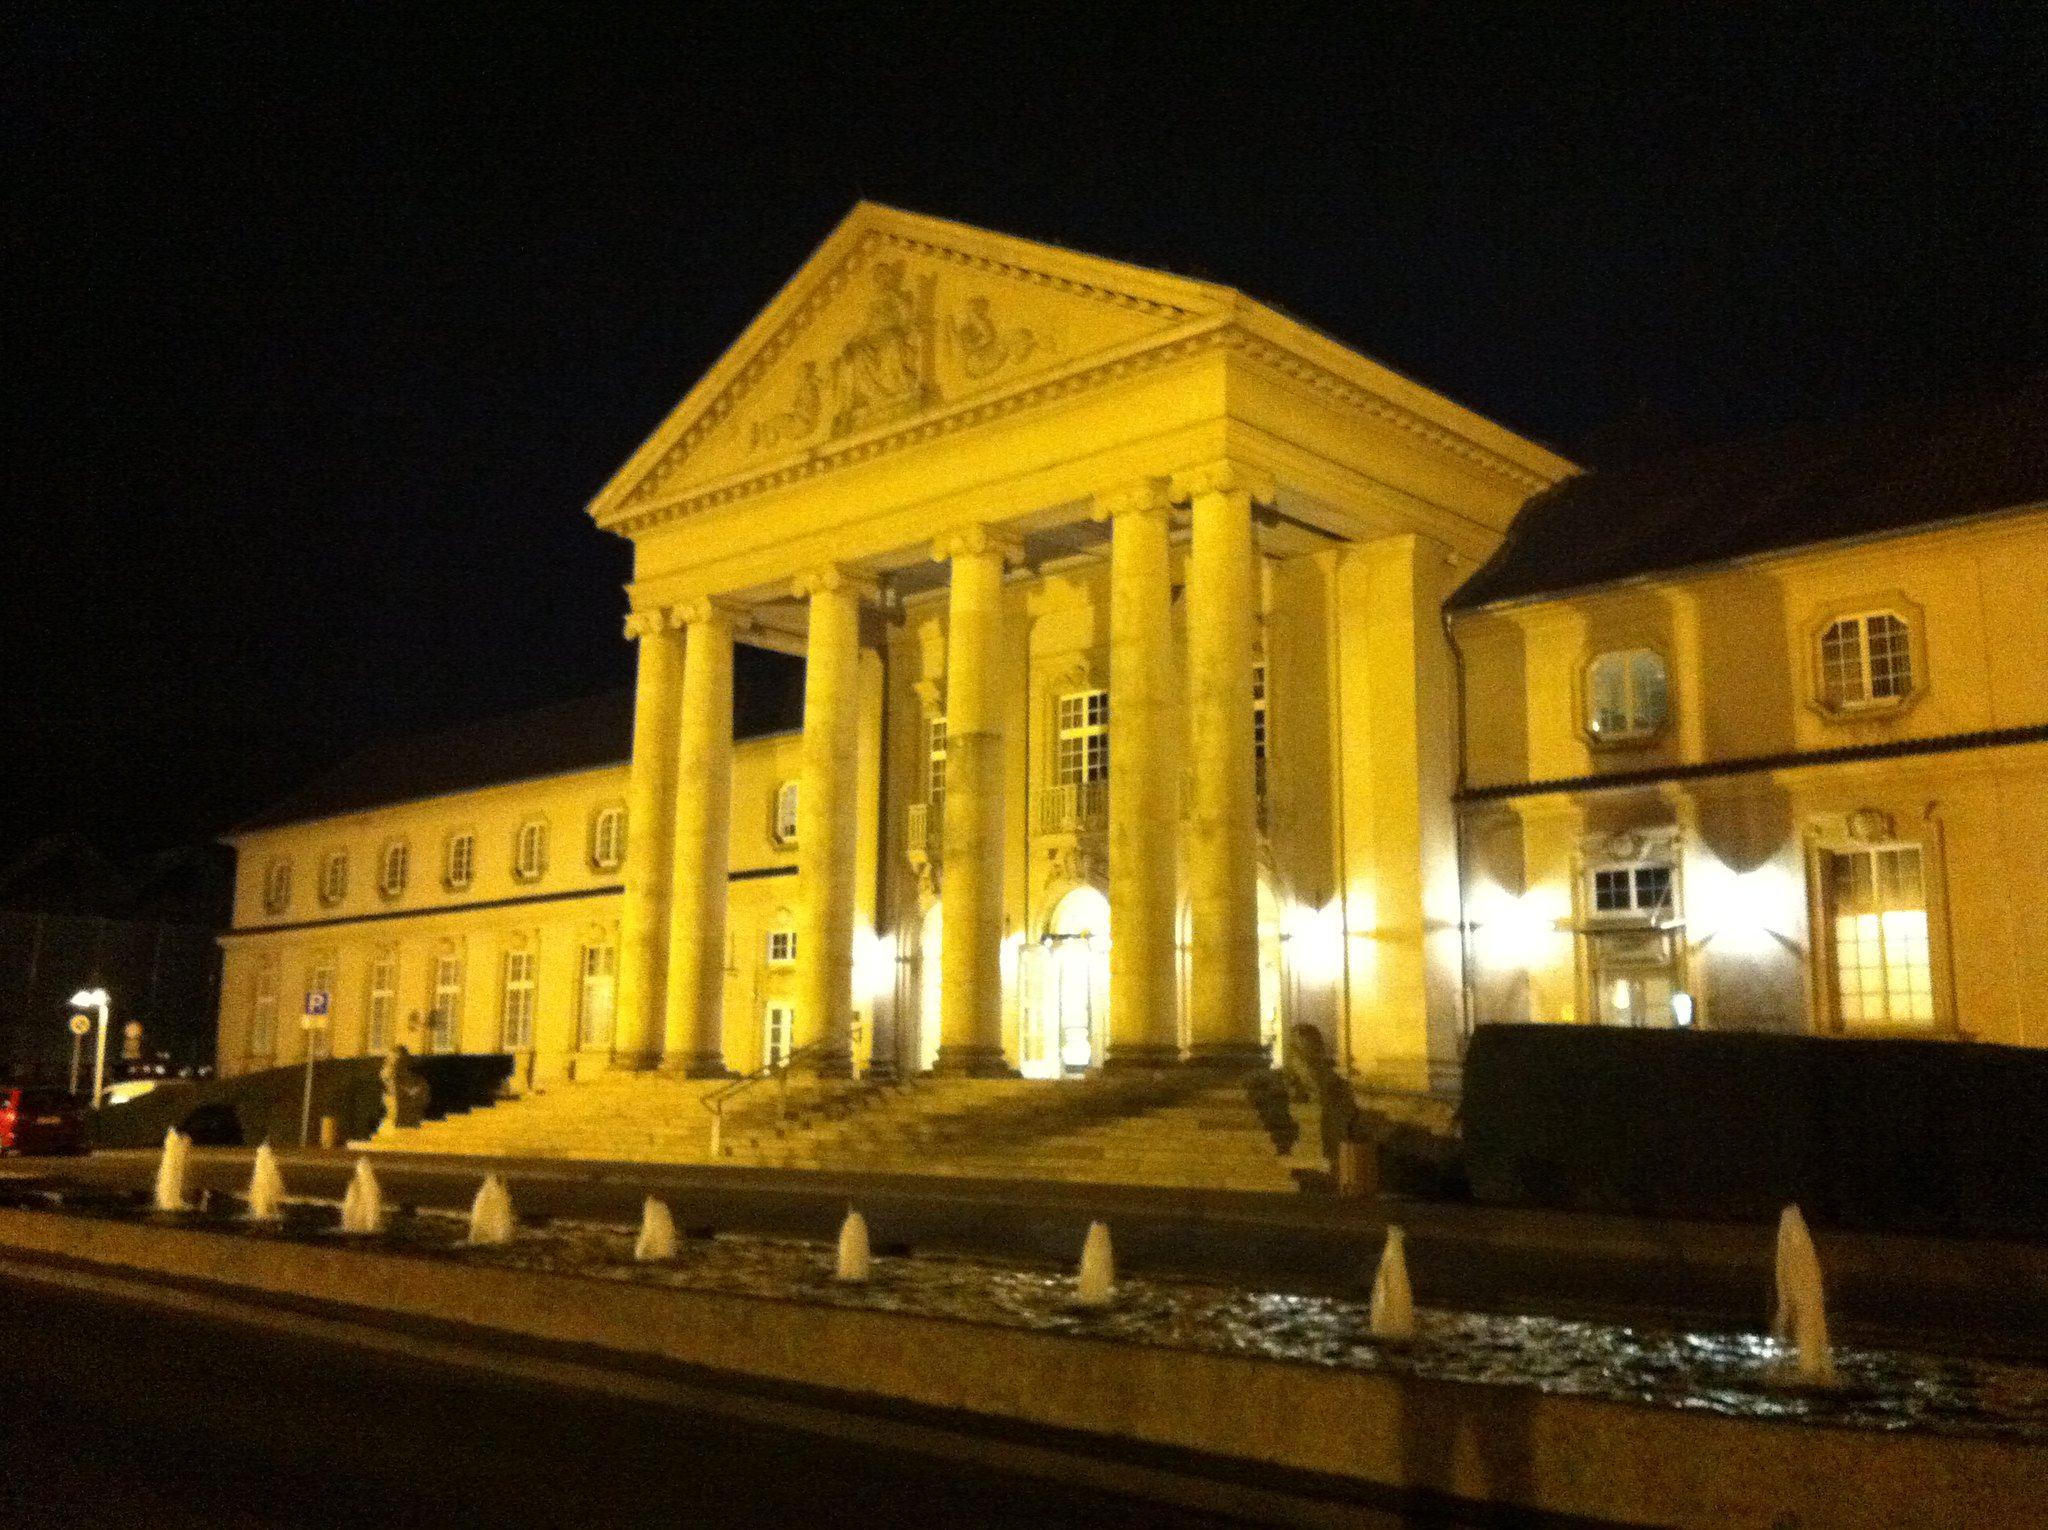 Casino Aachen, Spielbank Aachen, Spielbank Nordrhein-Westfalen